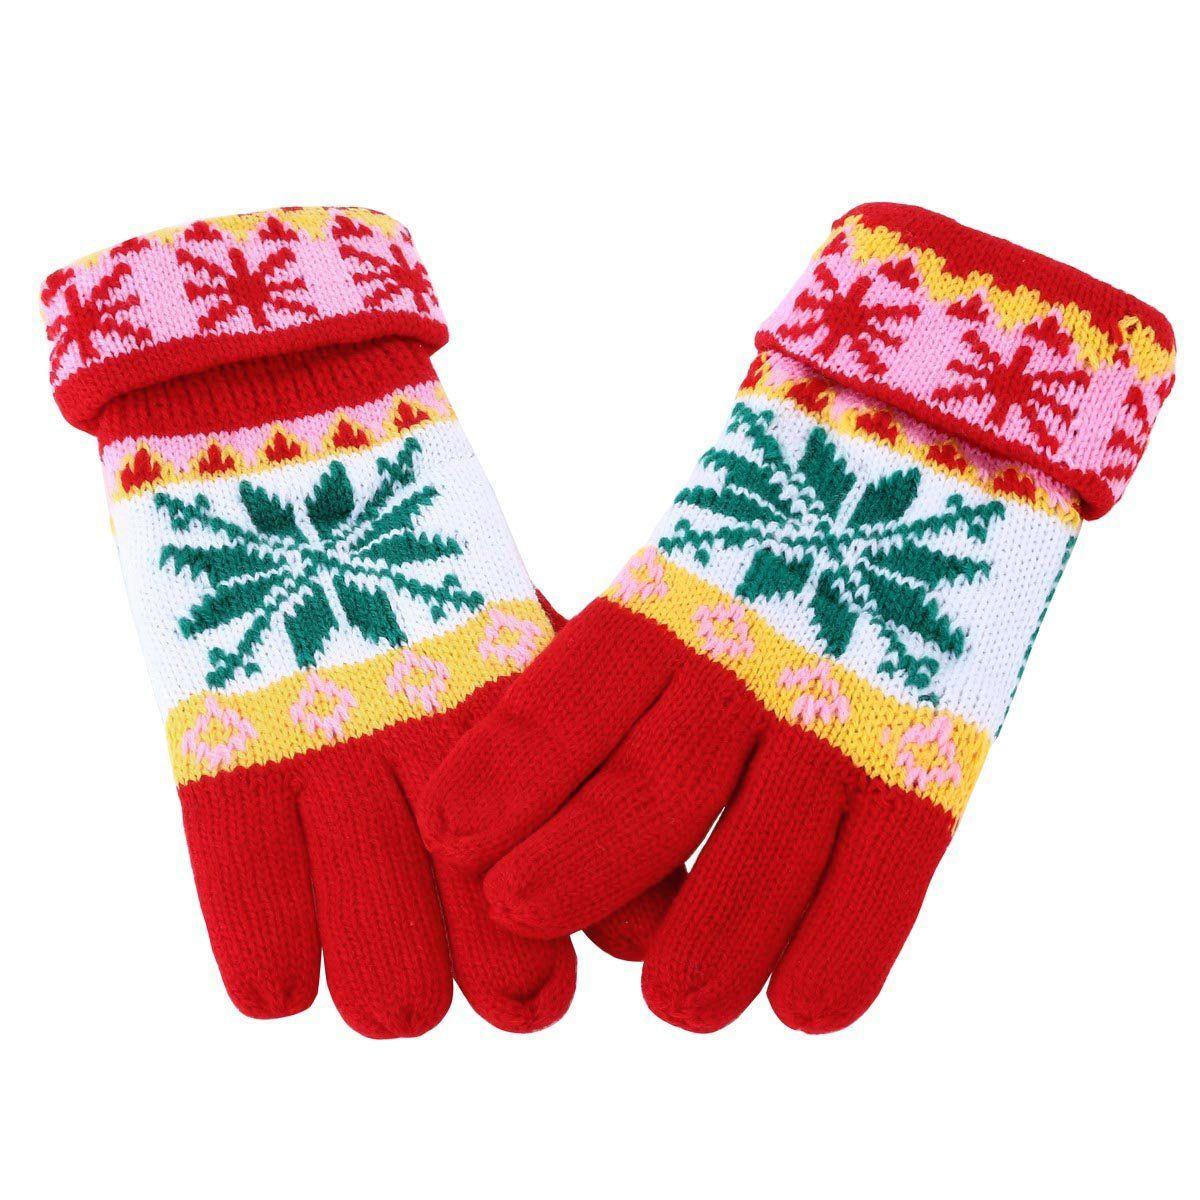 Damara Ladies & Girls Chunky Knit Fleece Lined Keep Warmer Gloves,Red